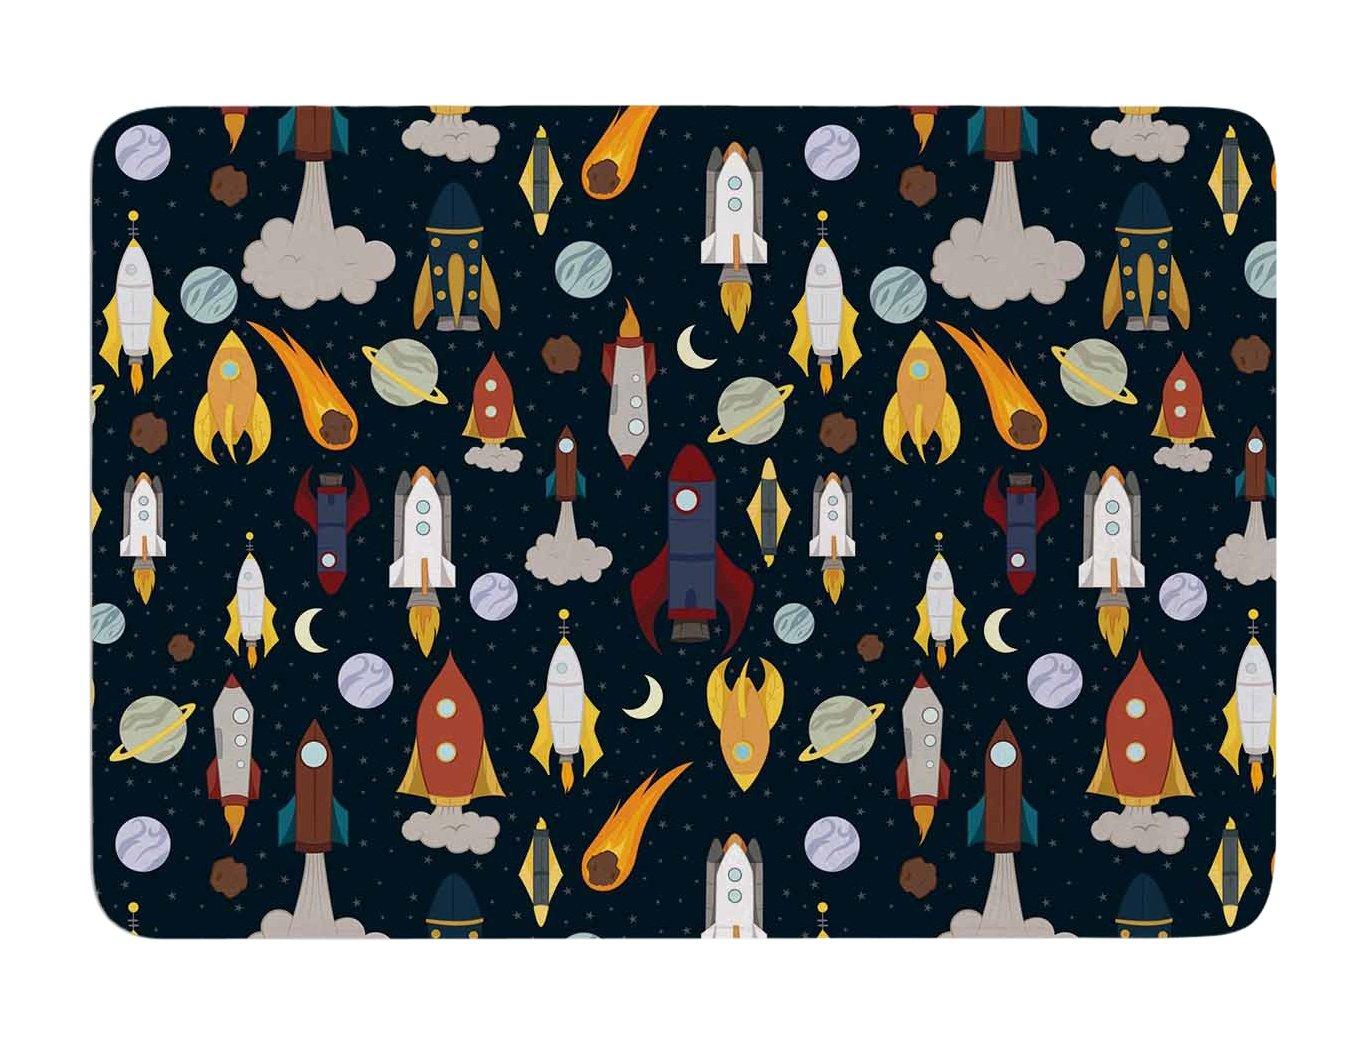 Kess InHouse Stephanie Vaeth Rockets Celestial Pattern Memory Foam Bath Mat, 17 by 24-Inch, 17' X 24'